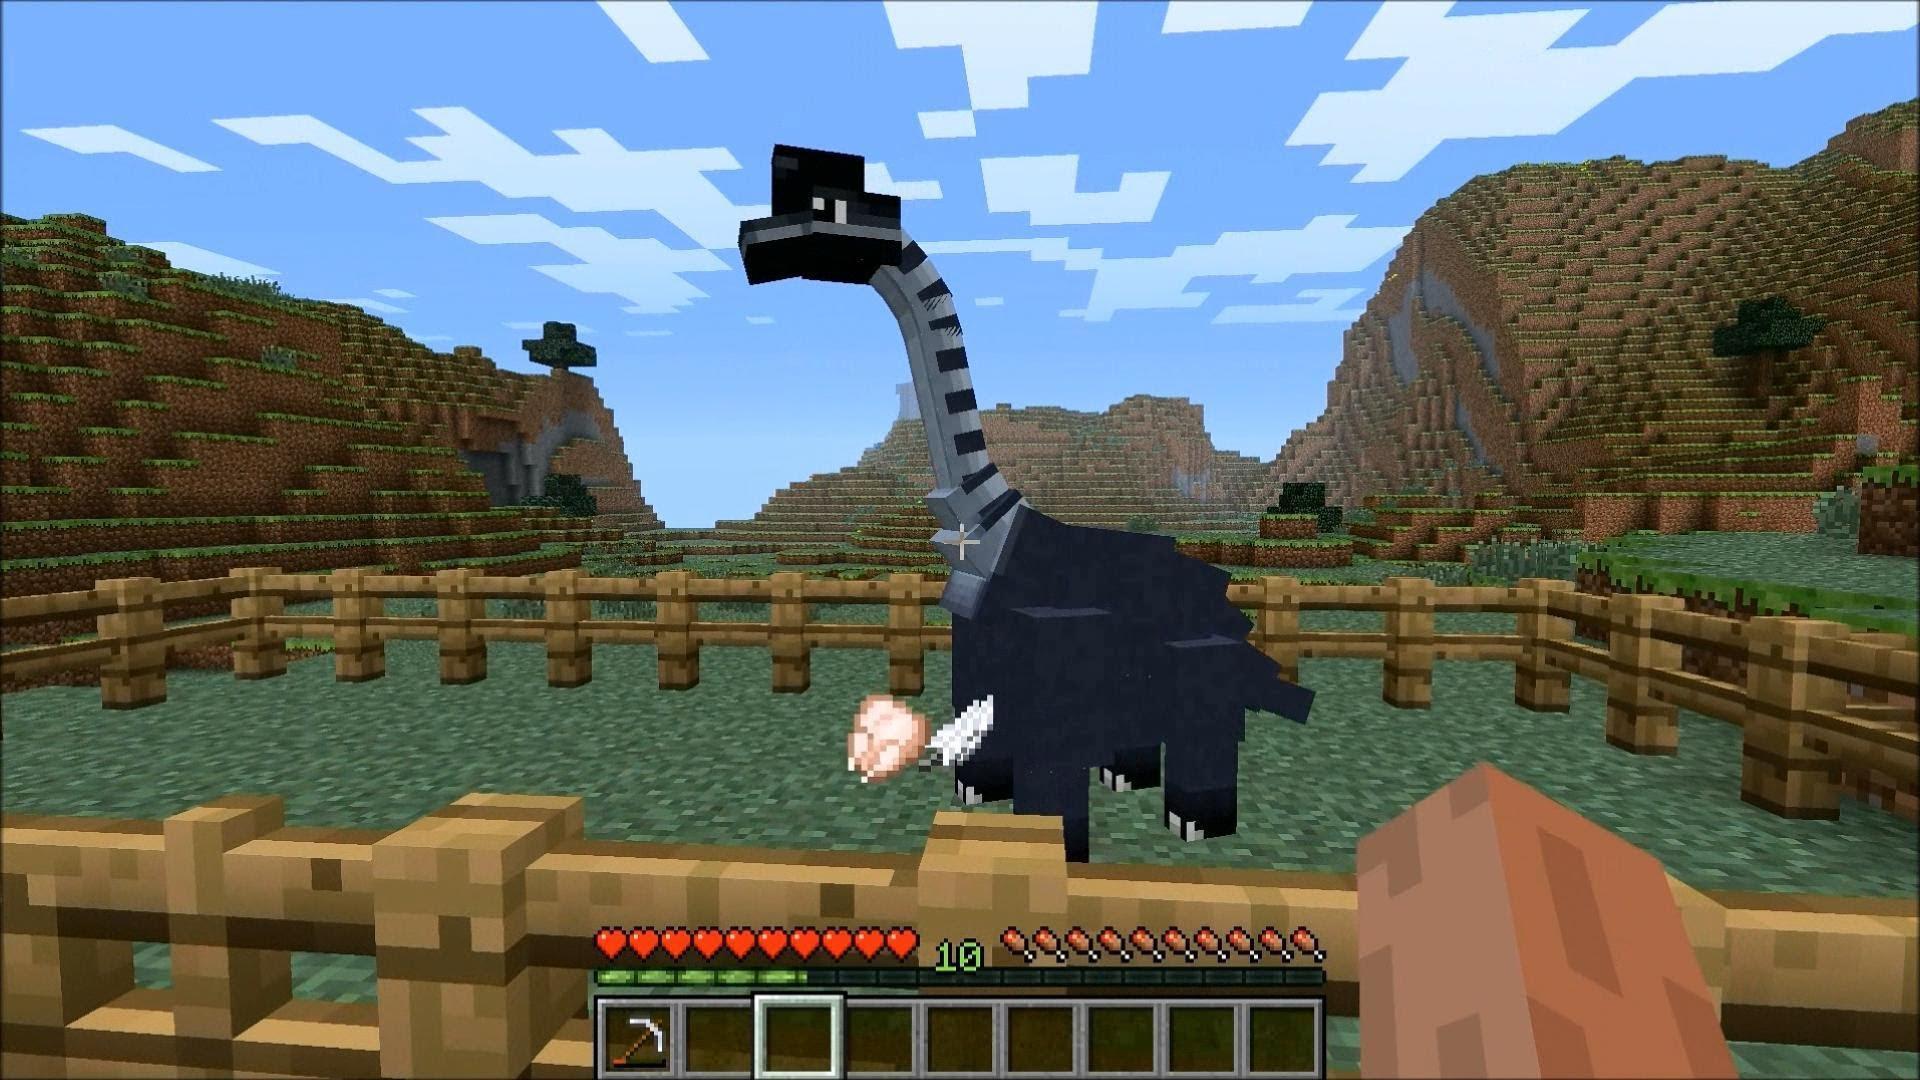 майнкрафт динозавры ютуб #6